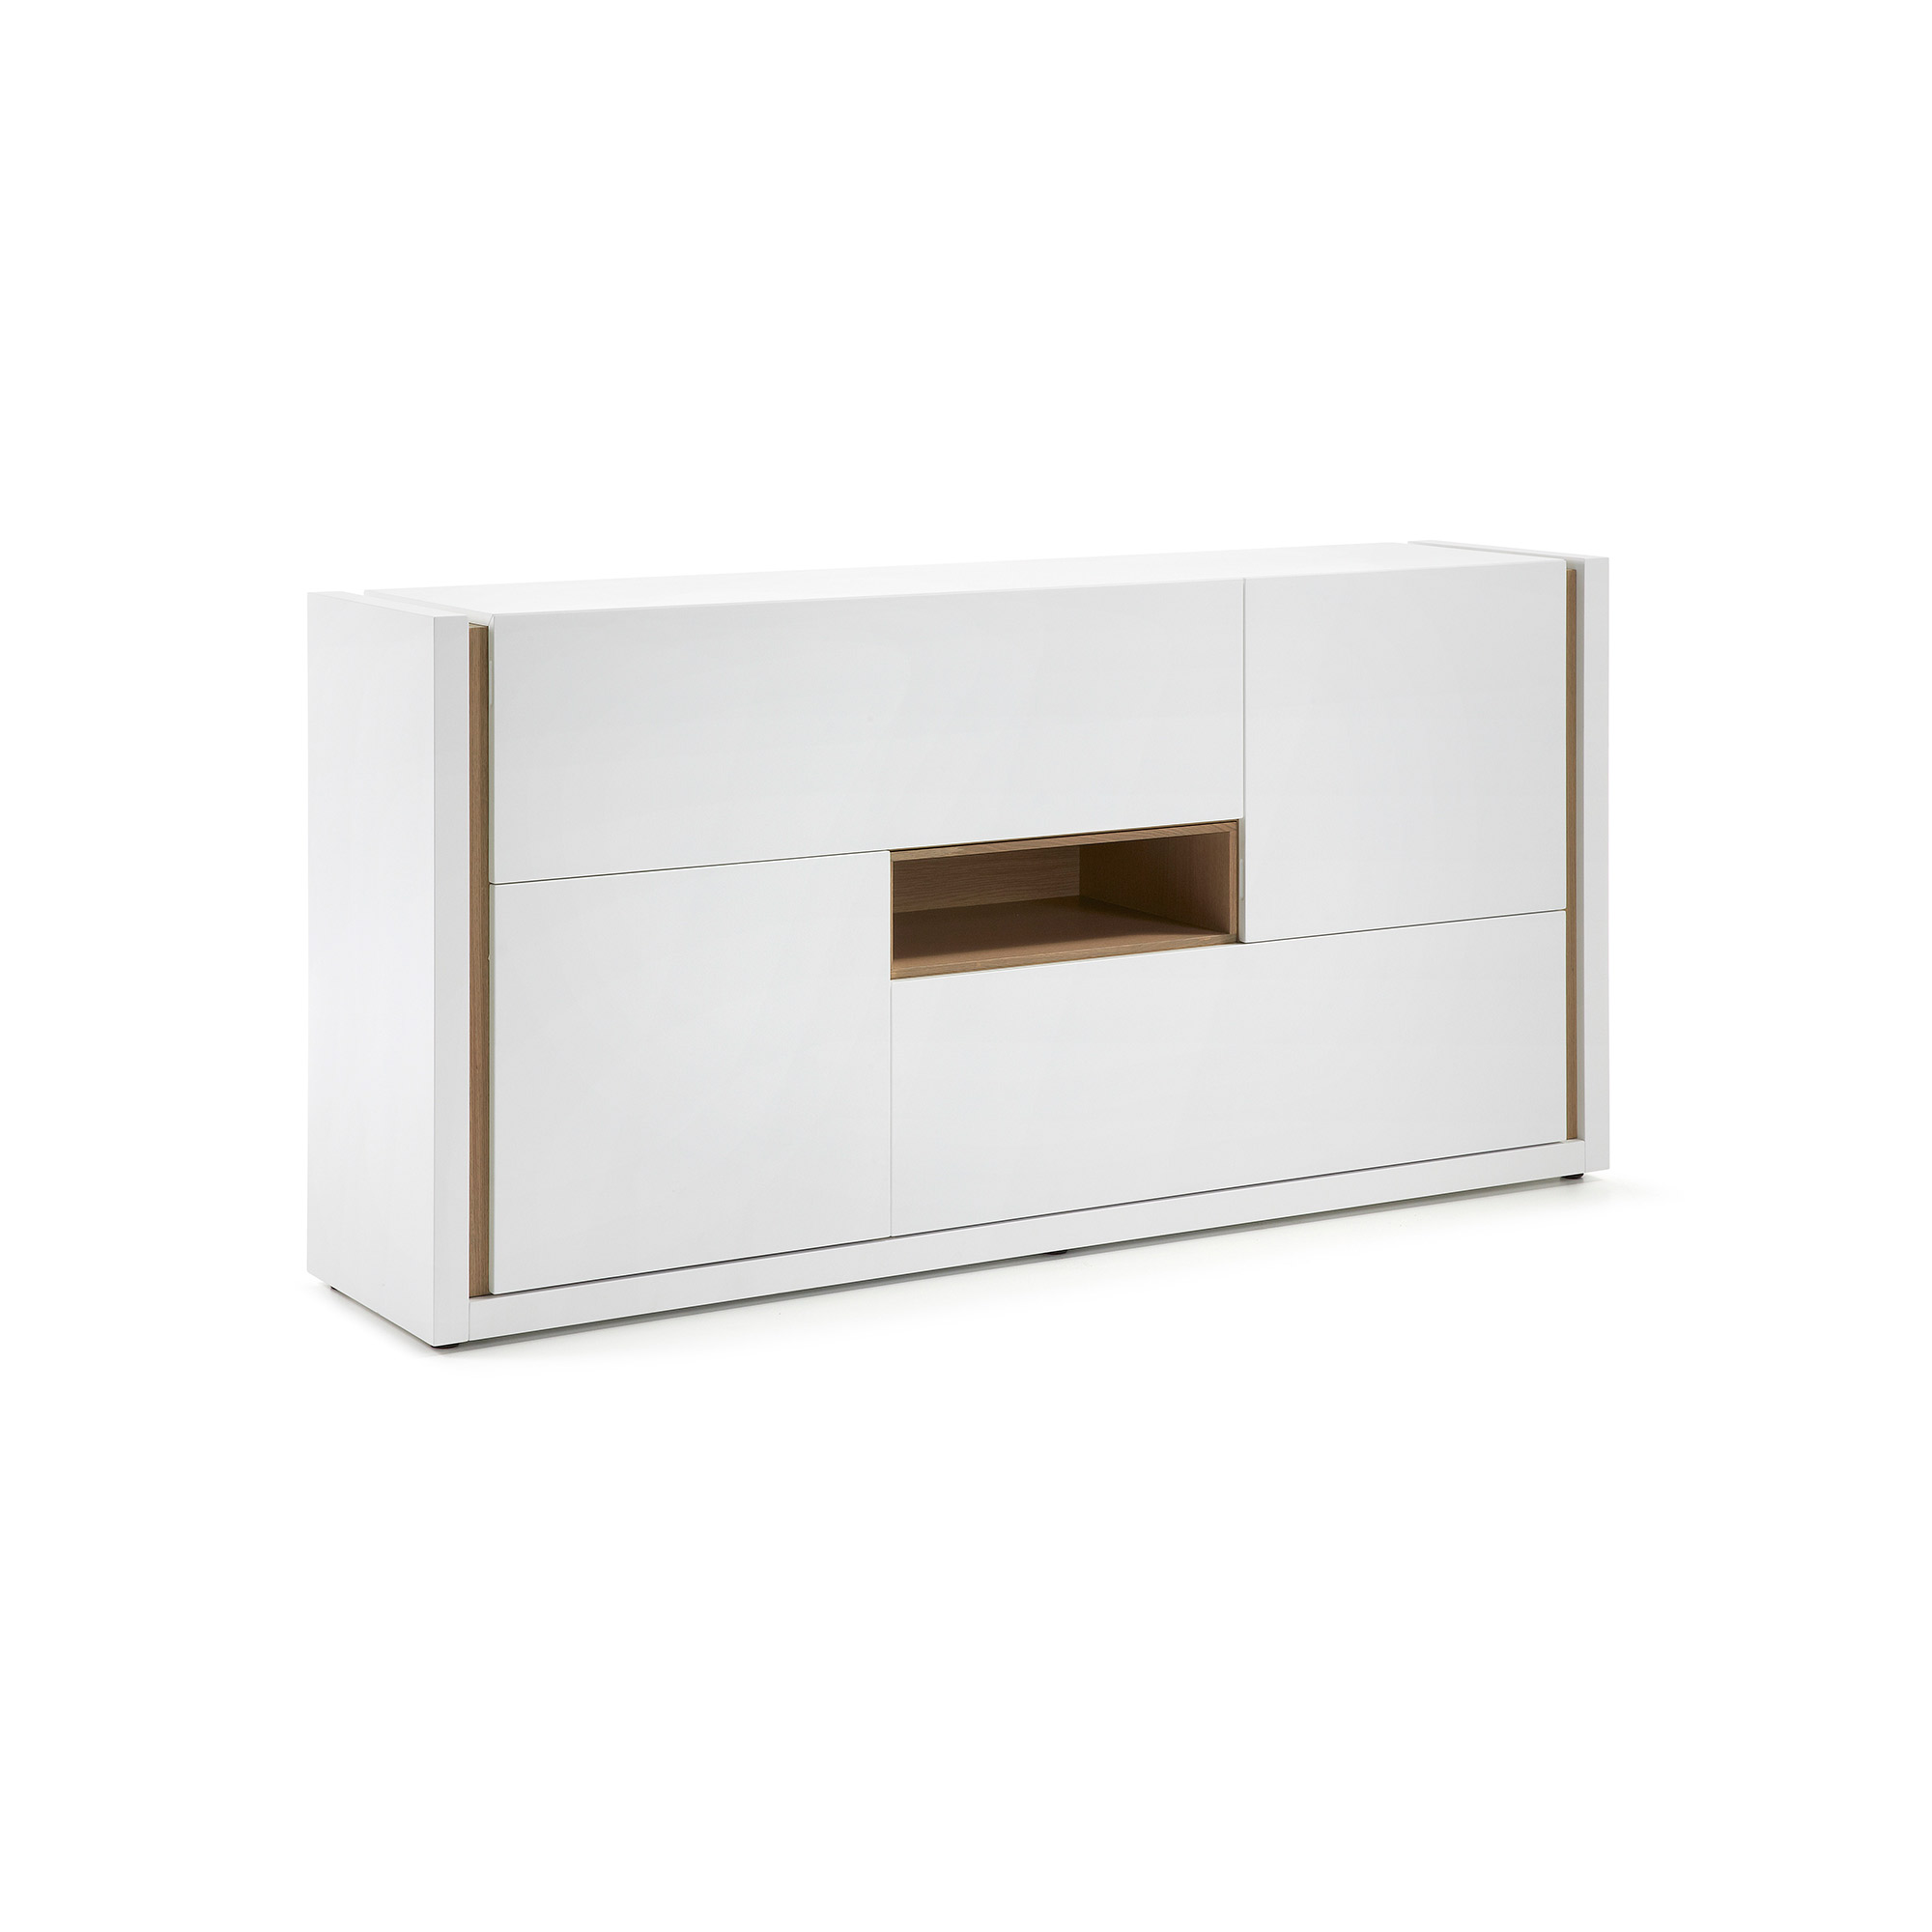 Kave Home - DE Sideboard 197 x 96 cm, weiss | Wohnzimmer > Schränke > Sideboards | Kave Home